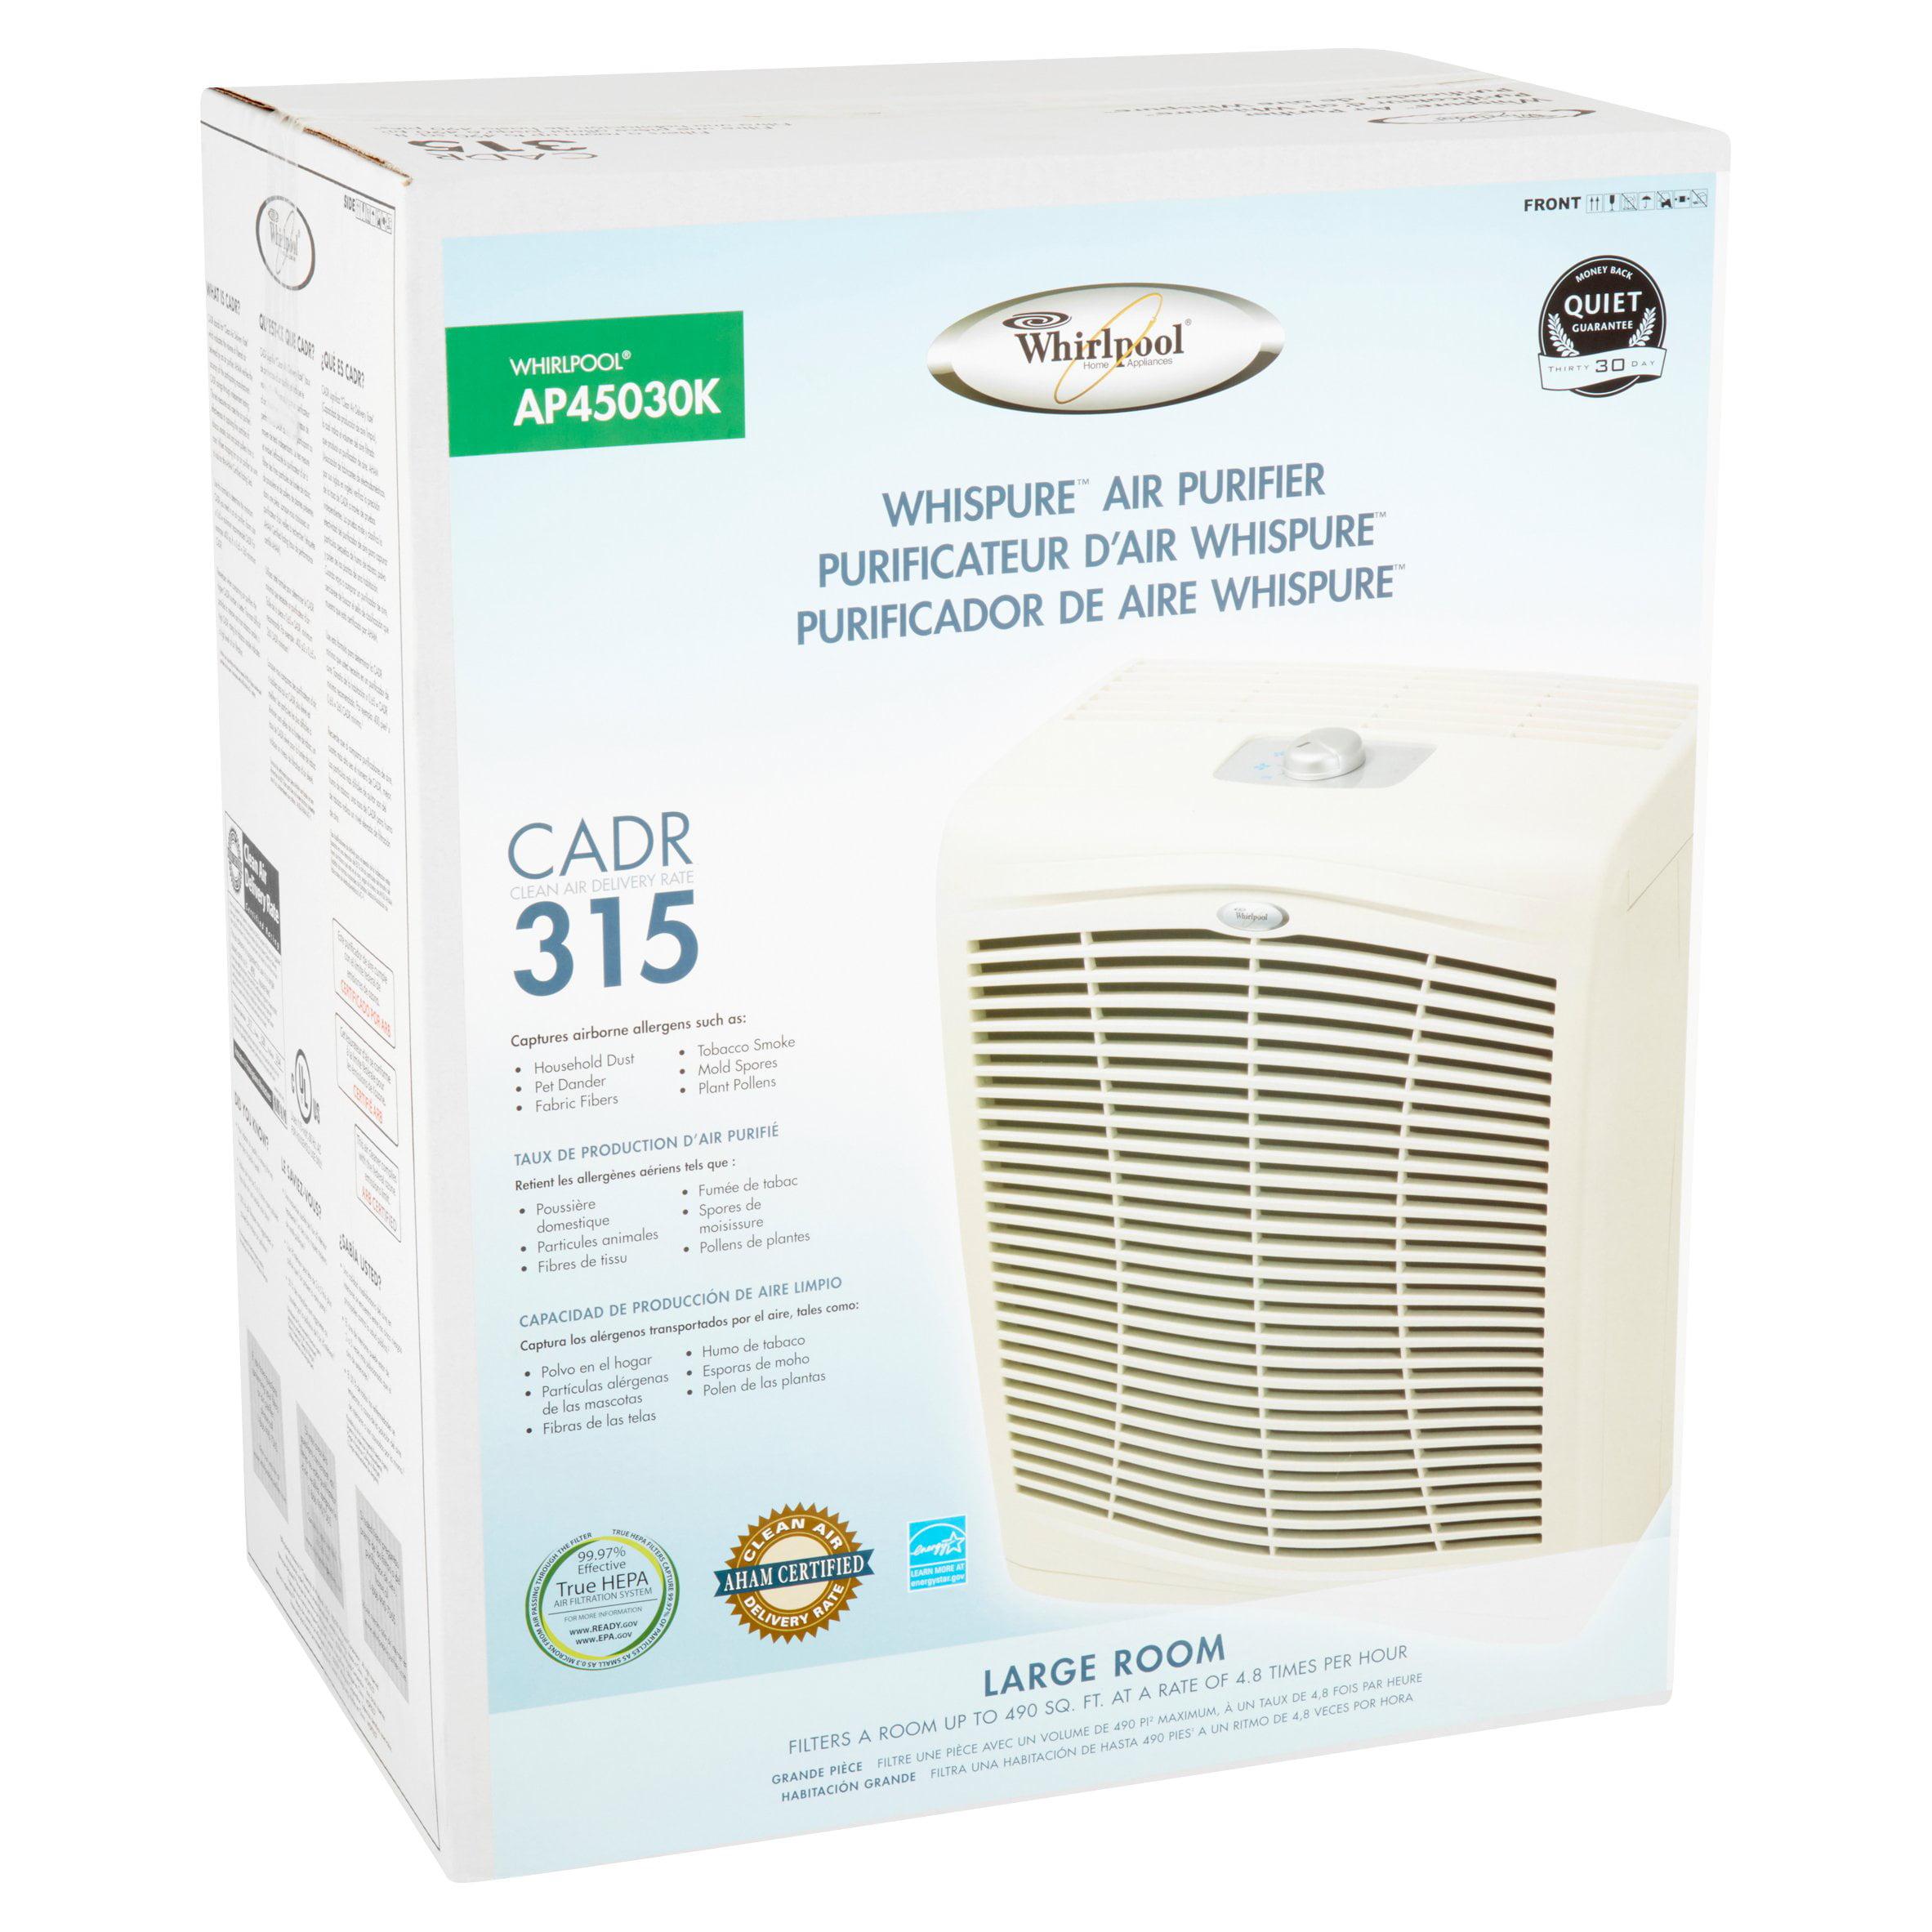 whirlpool whispure large room air purifier walmart com